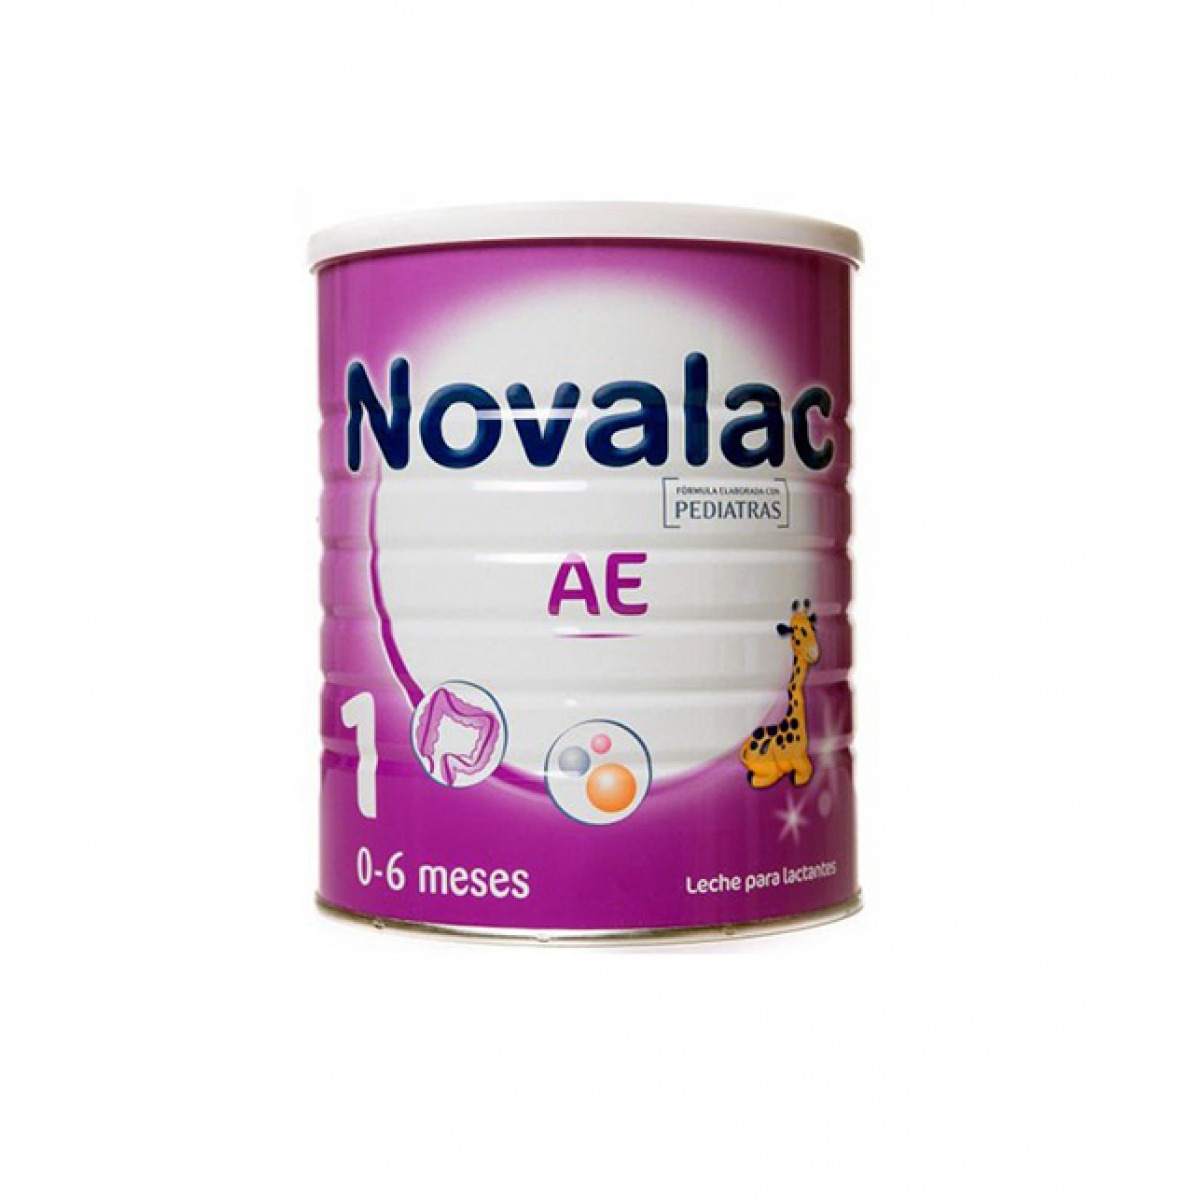 NOVALAC AE 1 LECHE DE INICIO 800 G.